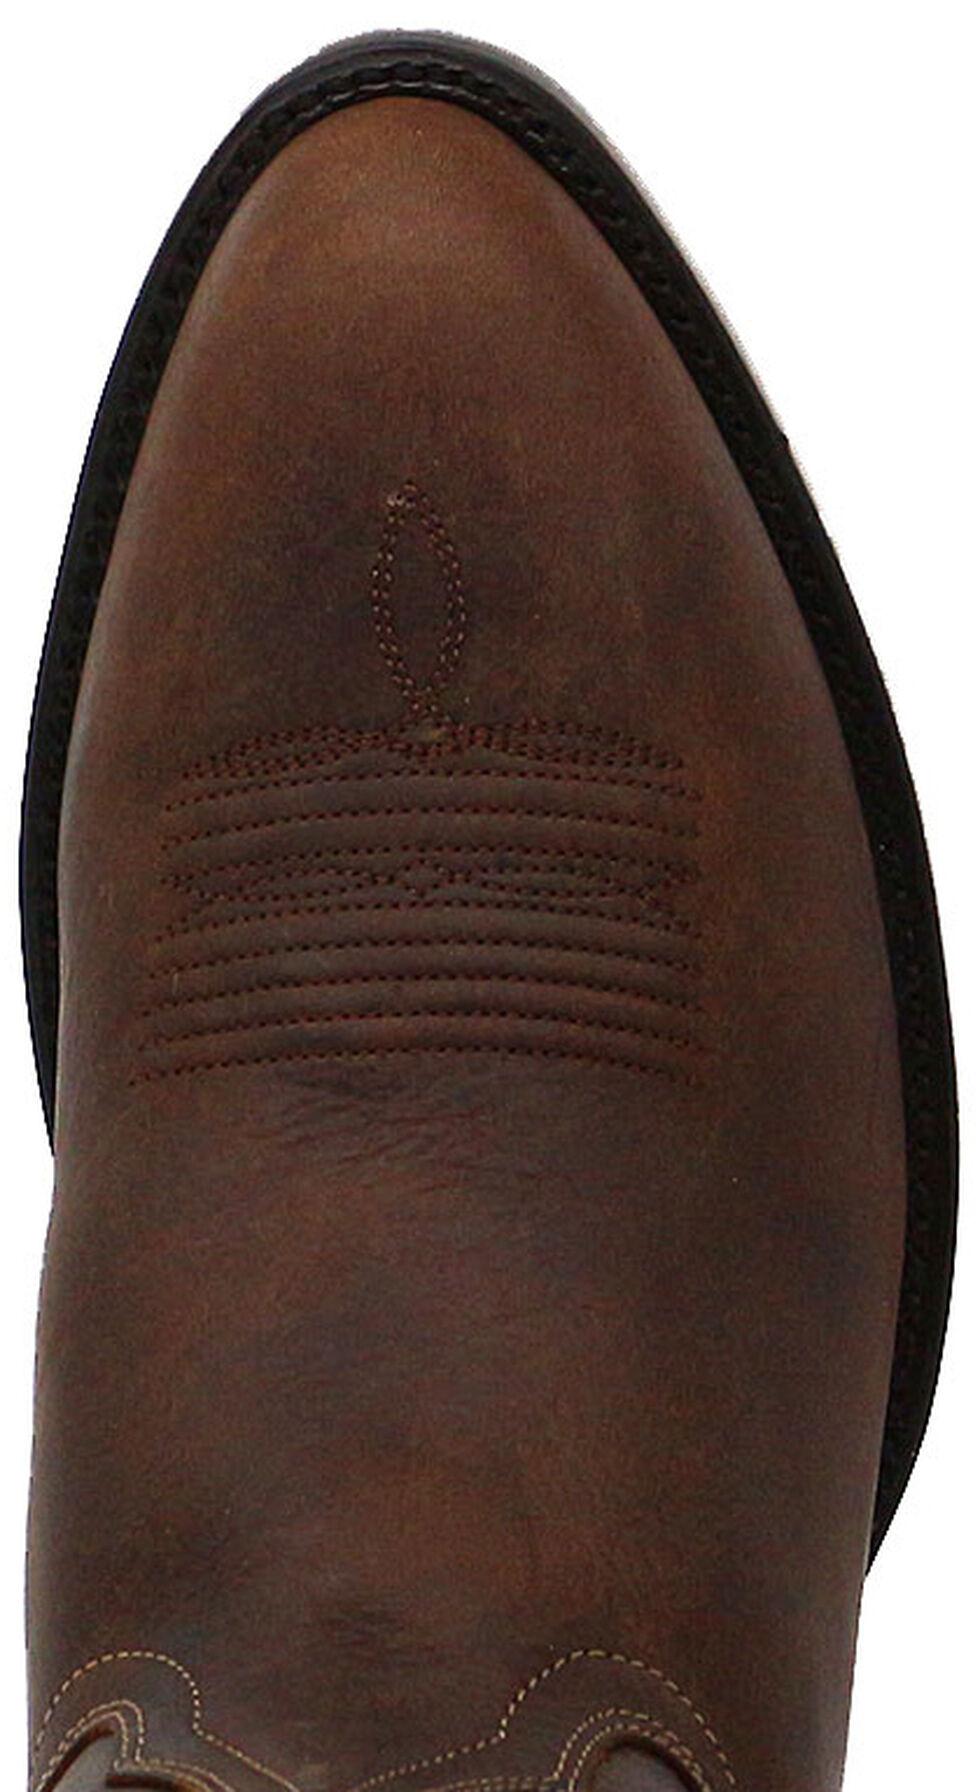 Cody James Men's Classic Brown Western Boots - Medium Toe, Brown, hi-res